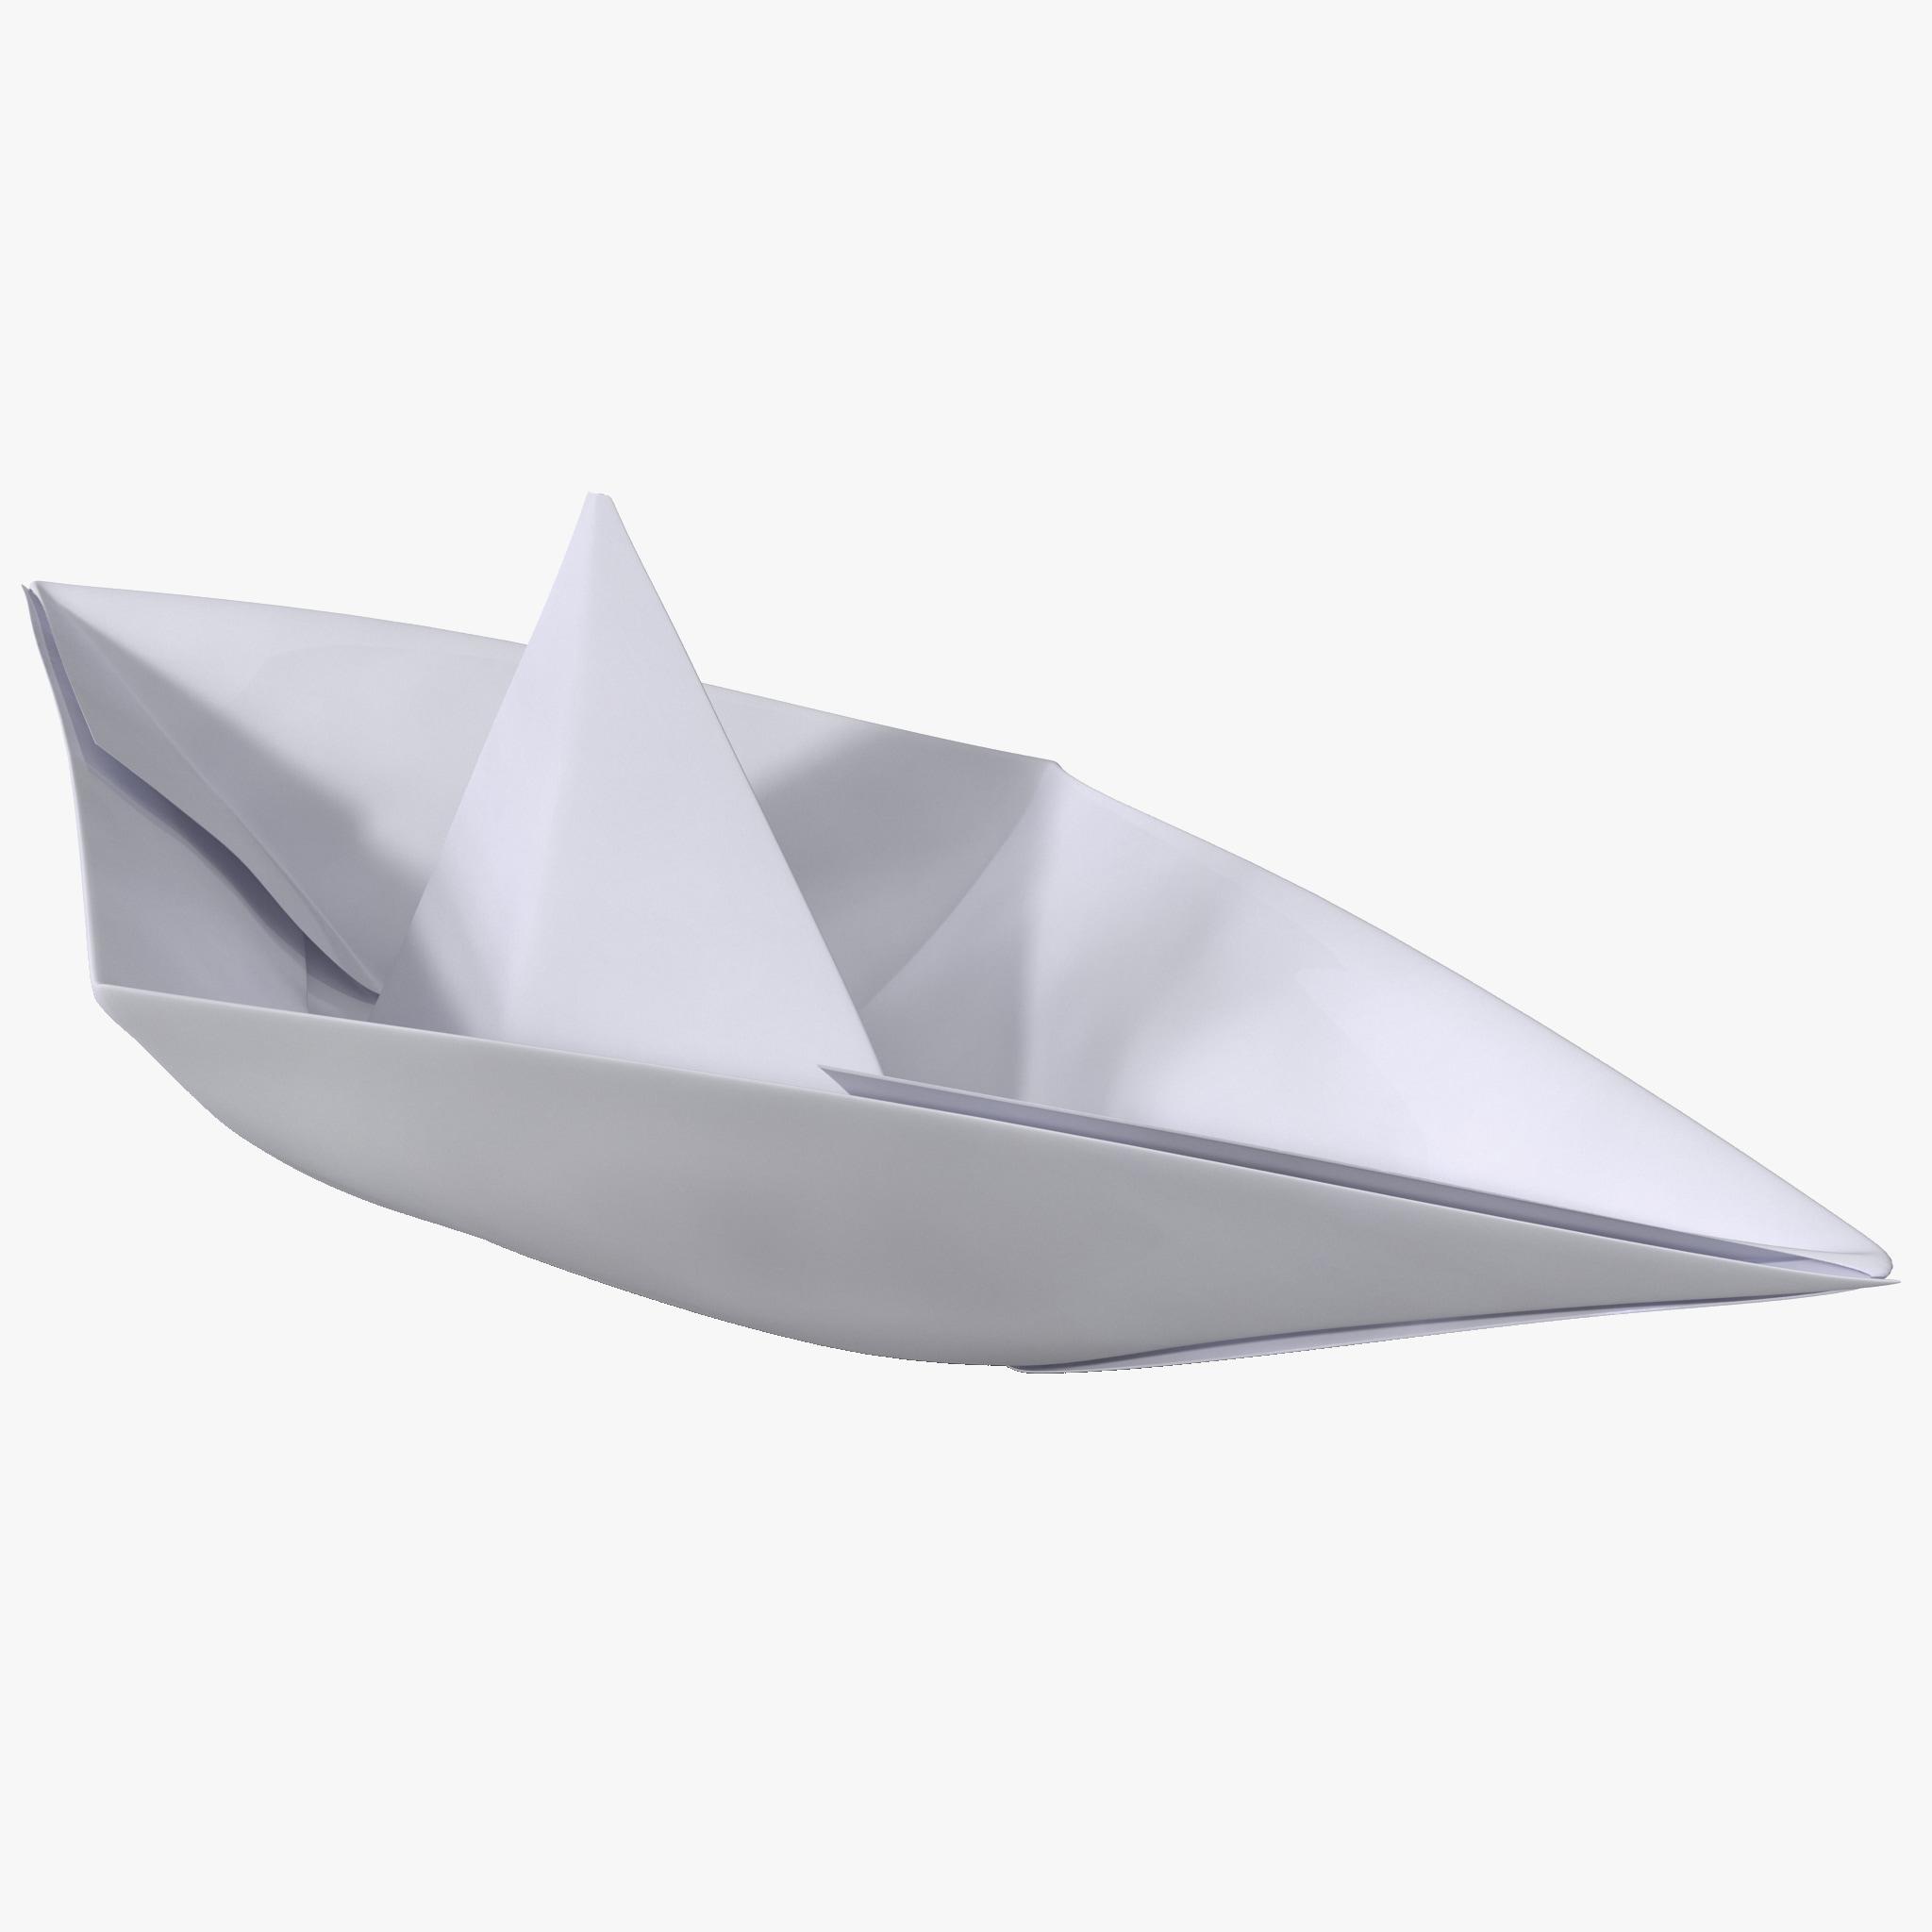 3d model origami ship